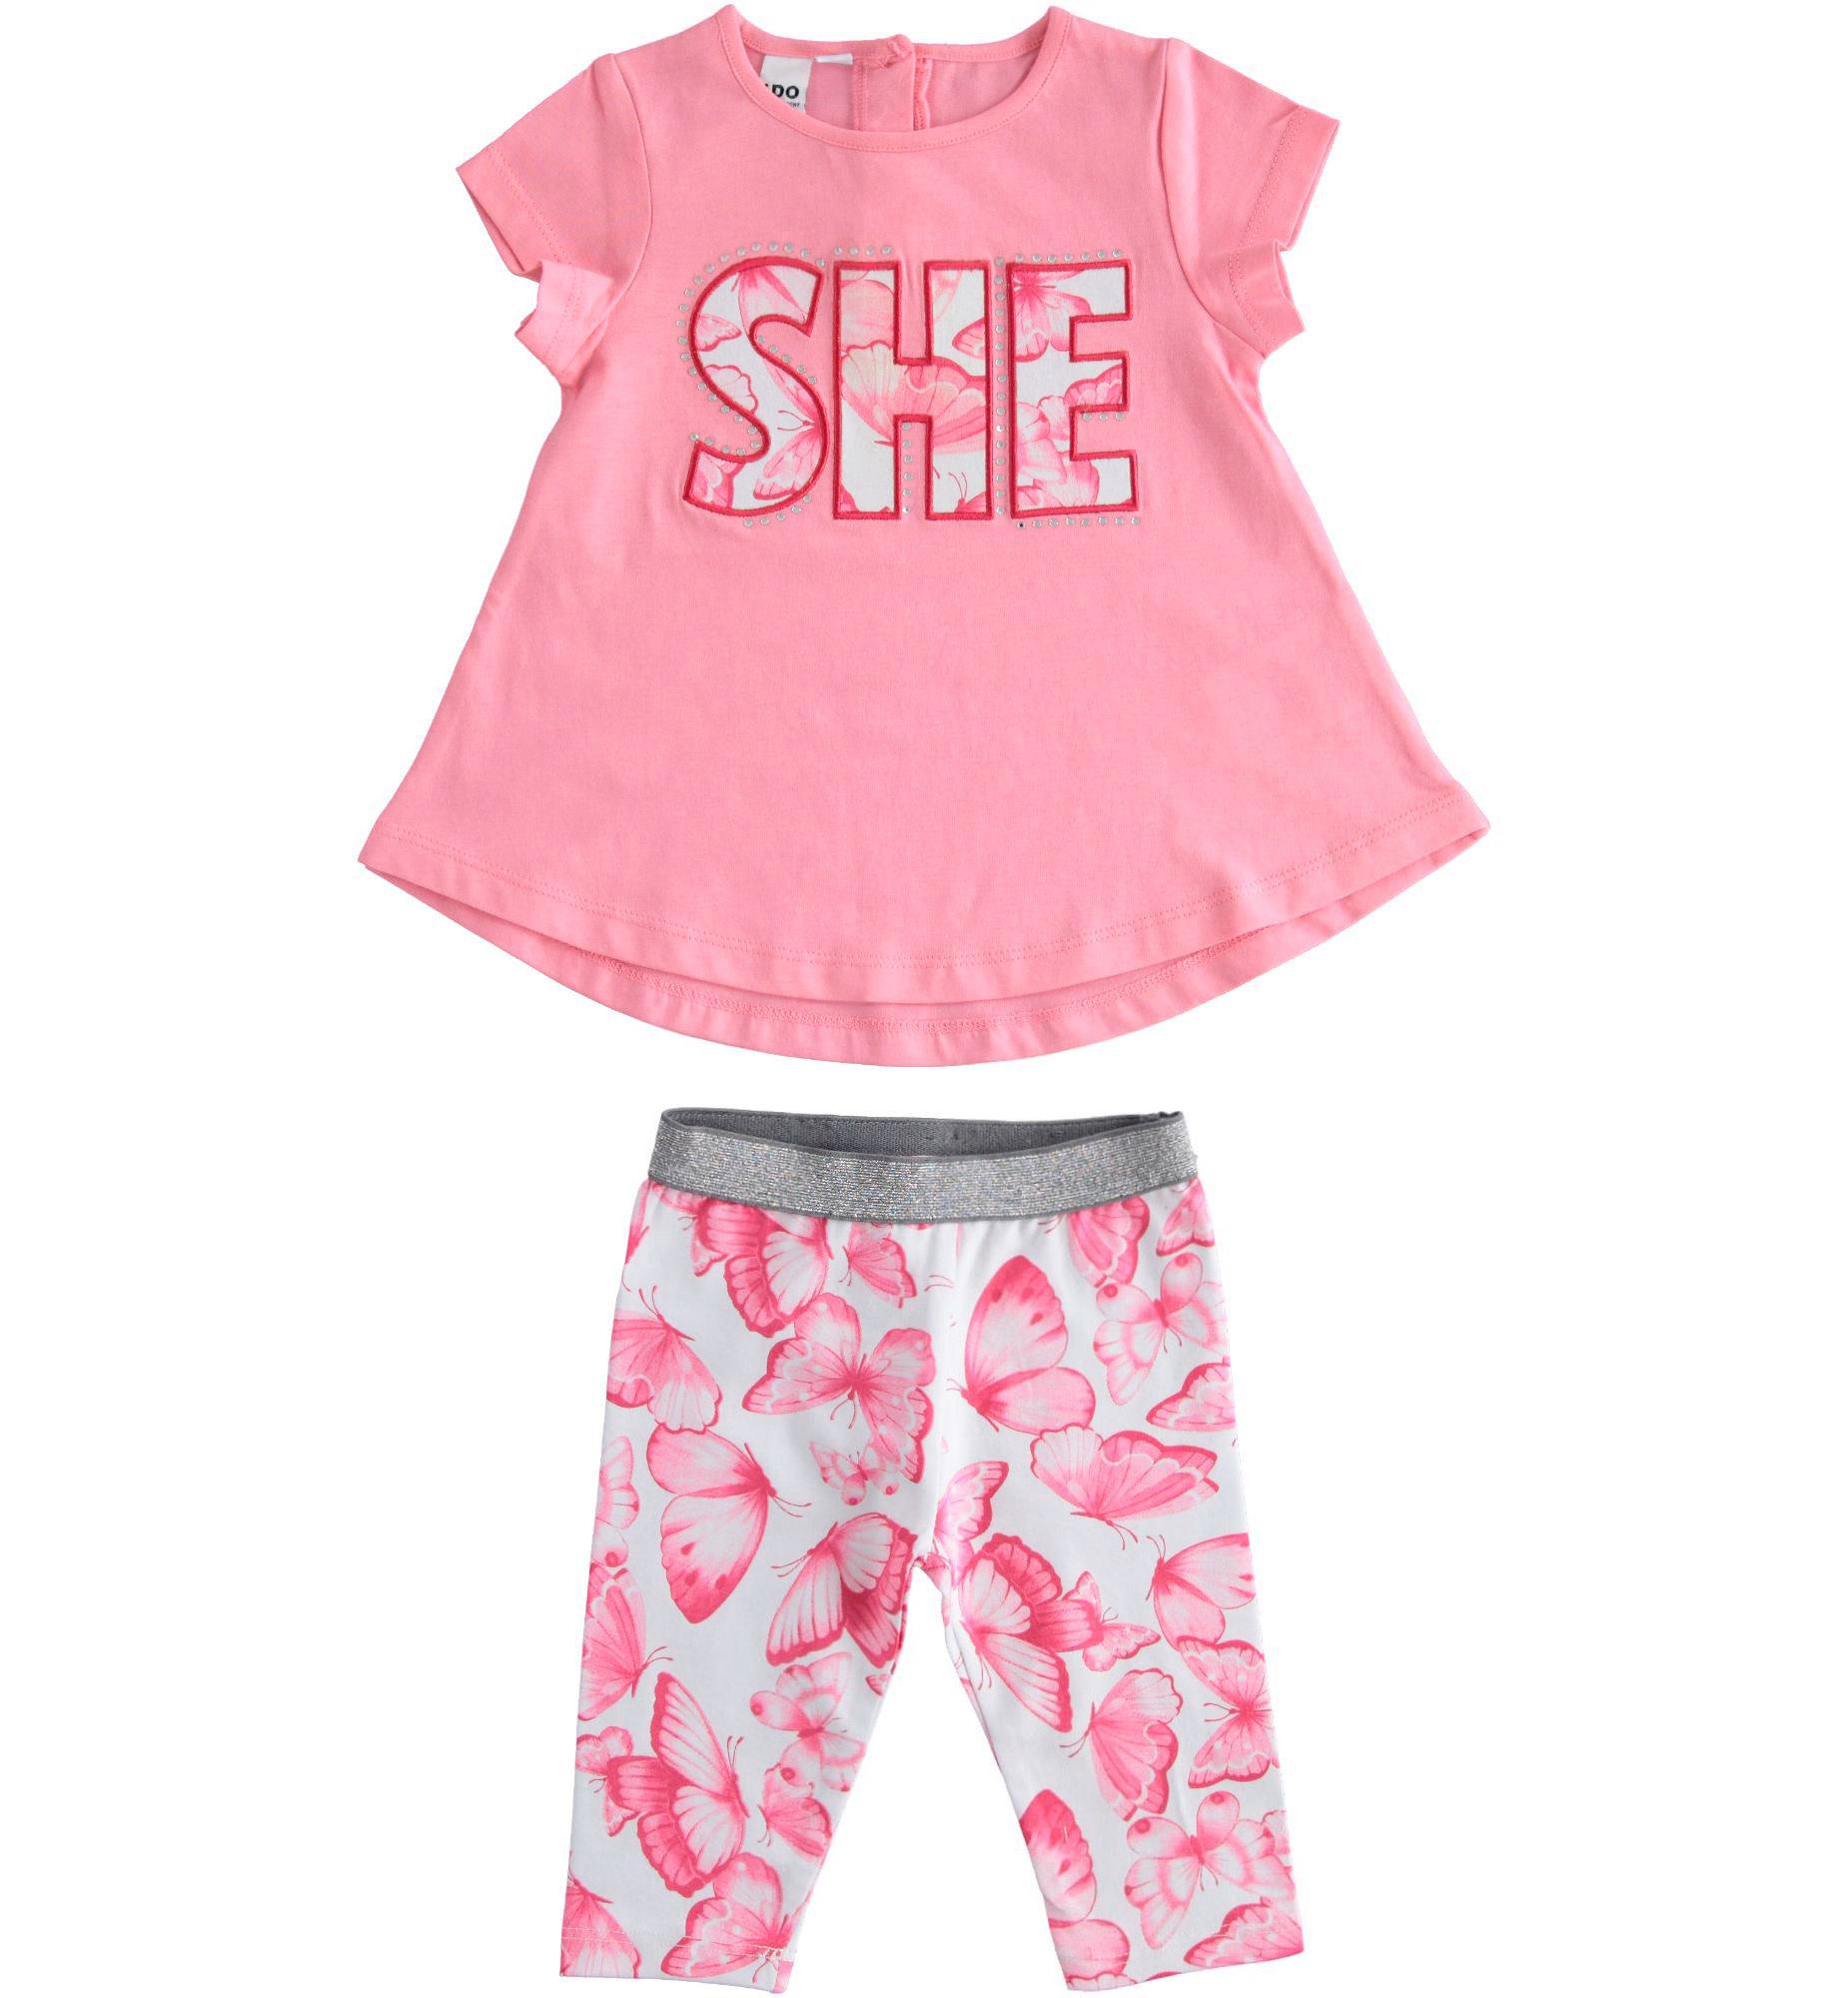 iDo iDO SS20 Girls SHE Pink Leggings Set J784